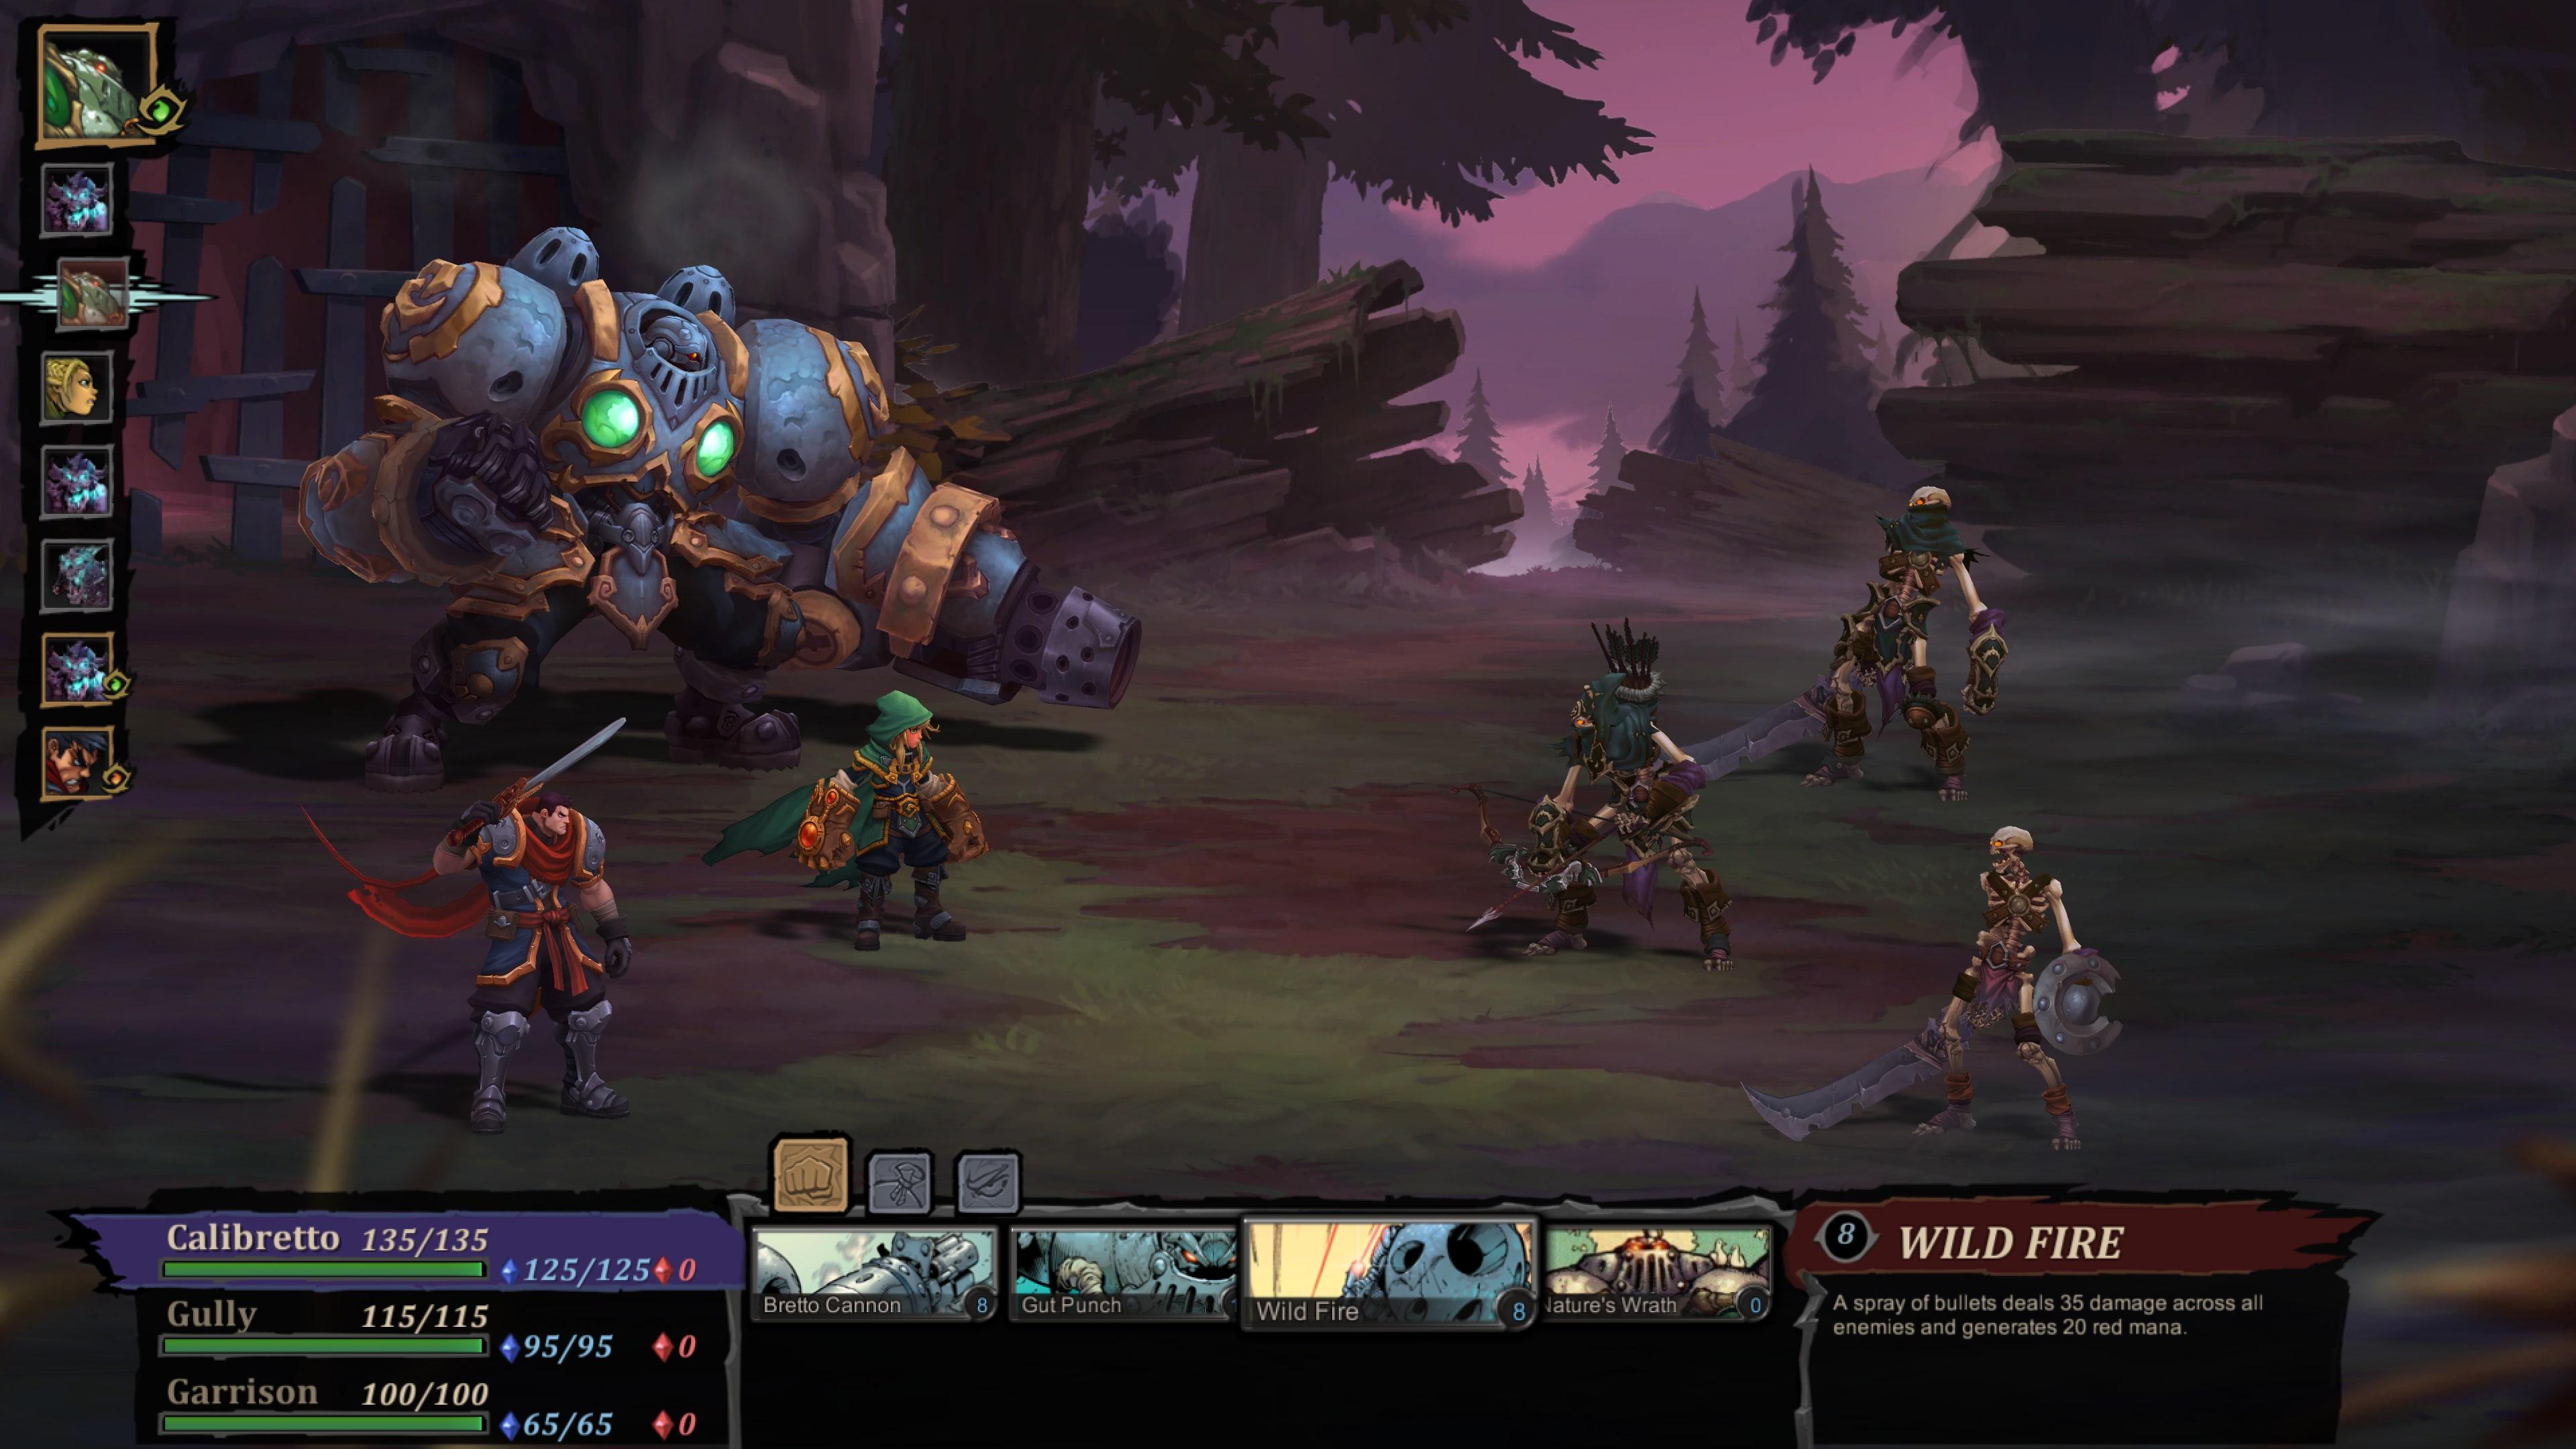 Hry pro Switch se rozrostou o Battle Chasers: Nightwar a Sine Mora EX 142189